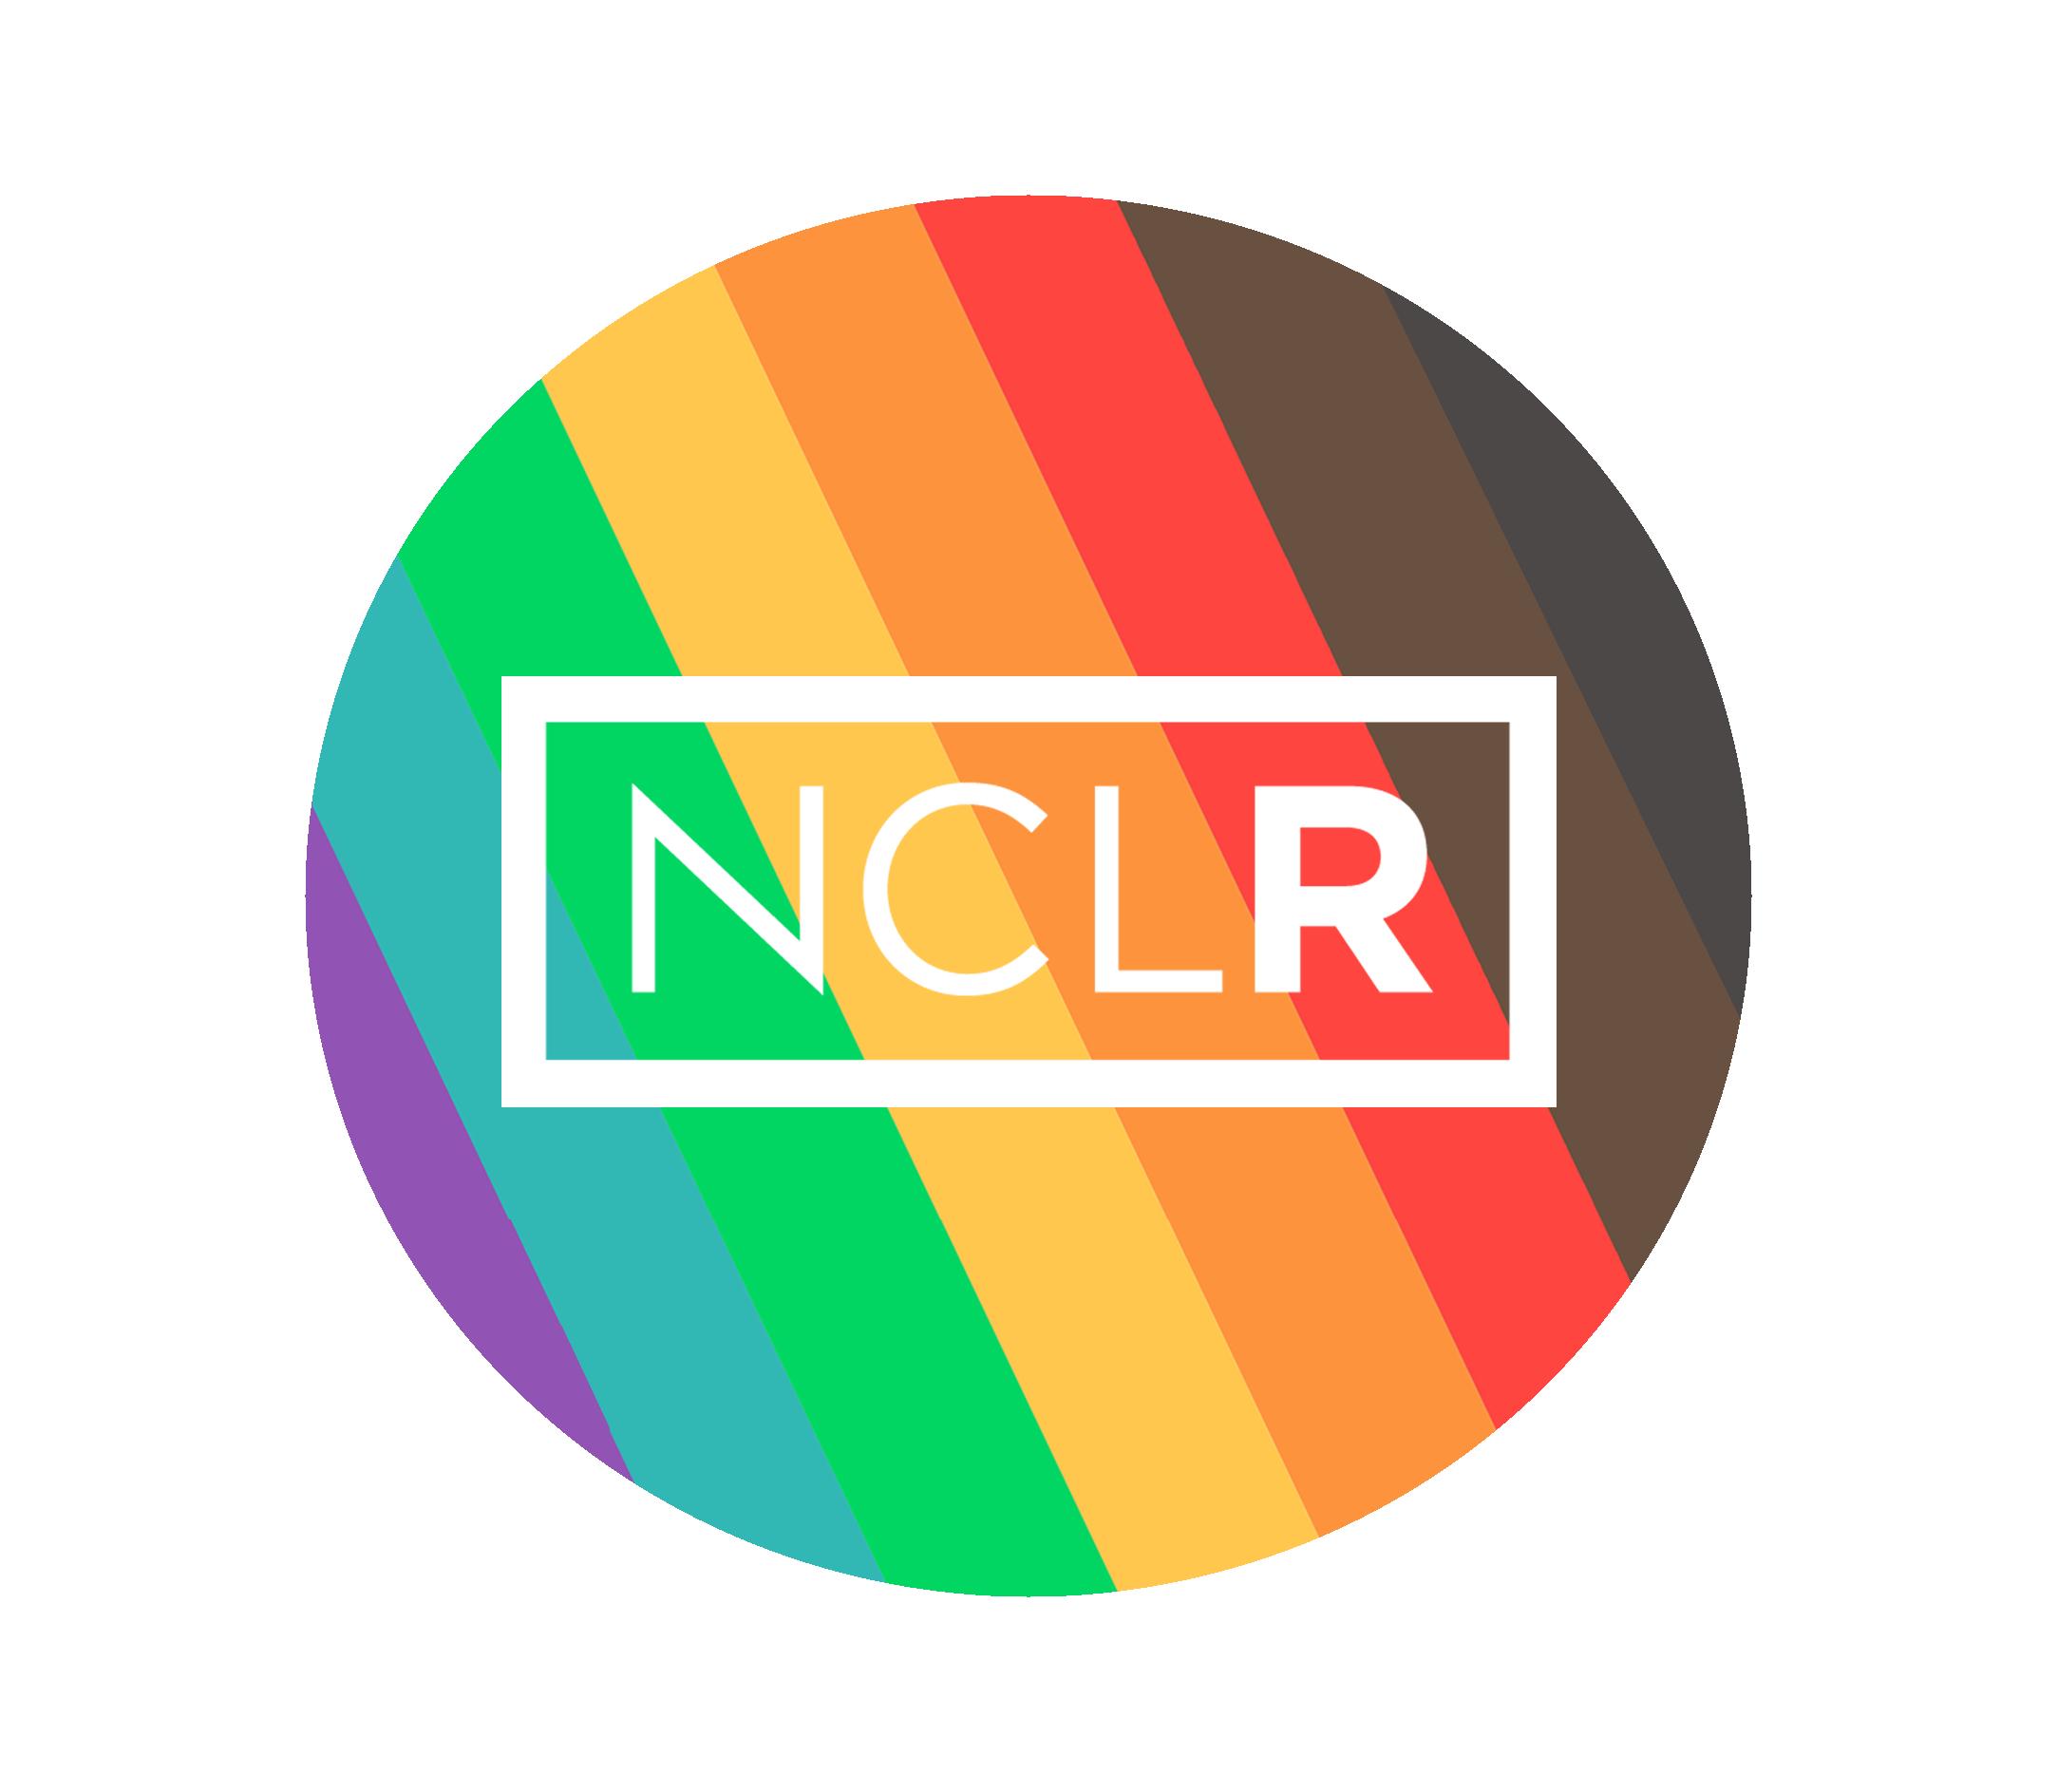 NCLR_PRIDE_STICKERS.png